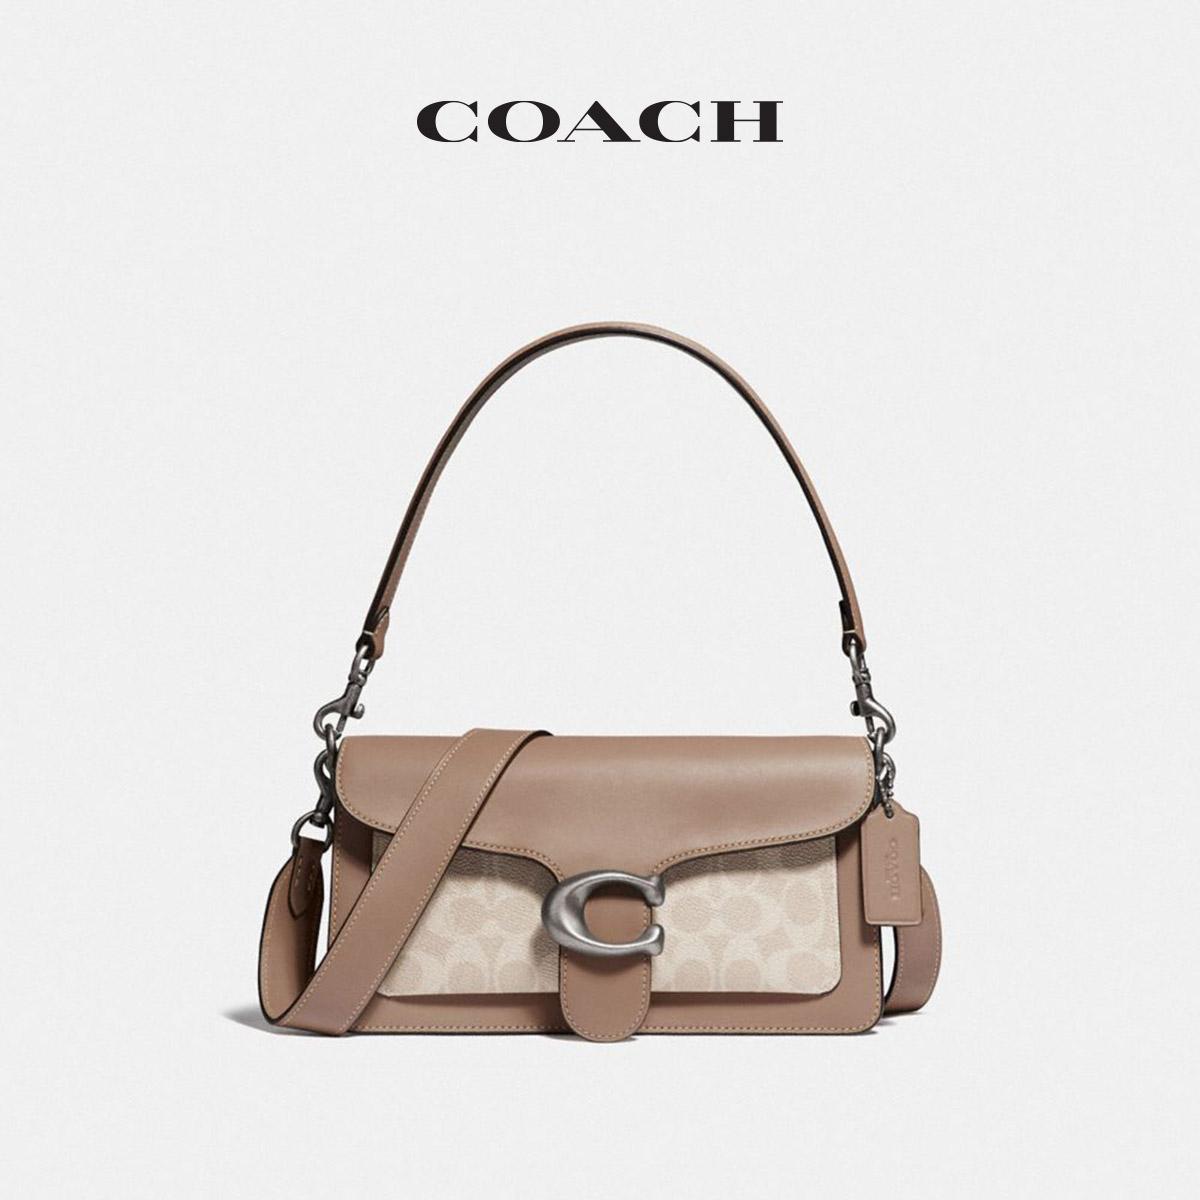 Coach / coach السيدات الكلاسيكية شعار المغلفة TABBY 26 حقيبة الكتف Dionysus حقيبة يد الاتجاه الجديد